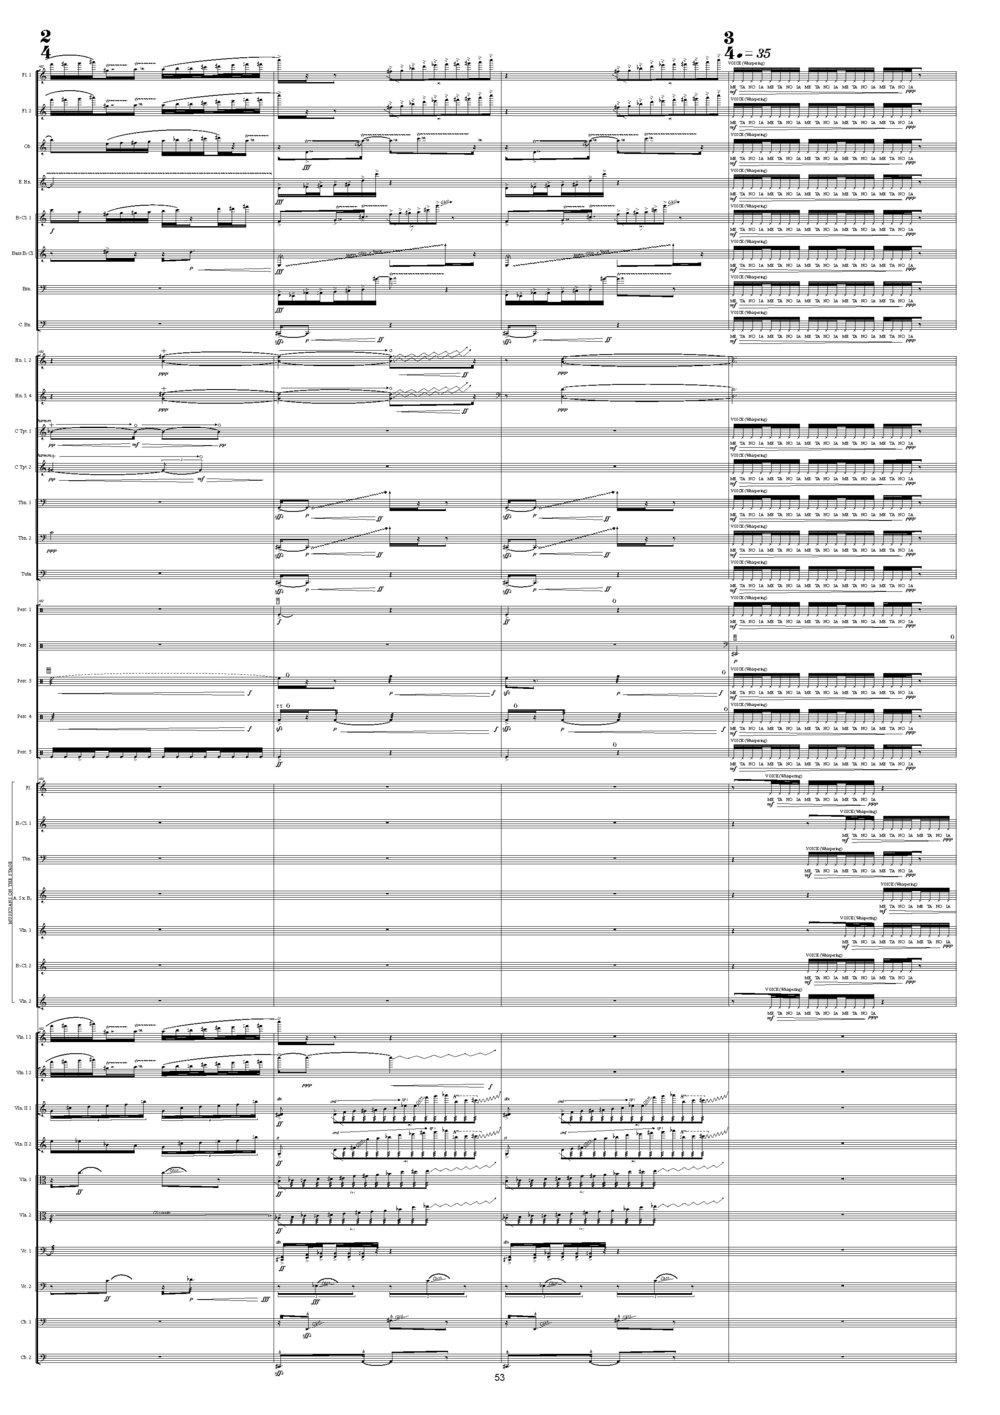 METANOIA_2009-RAPPOPORT_Seite_53.jpg